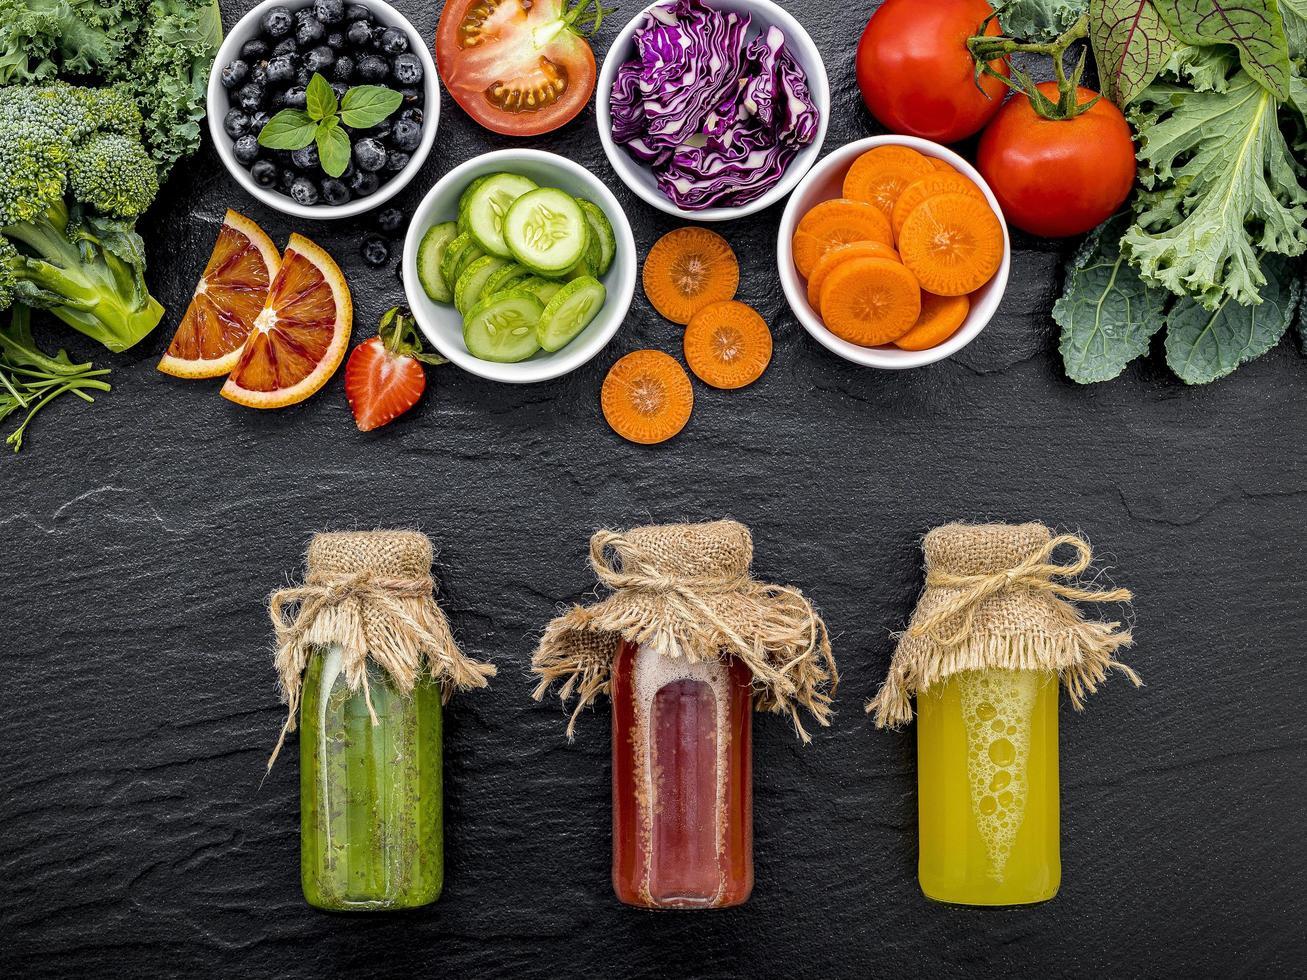 Fruit and veggies with juice photo